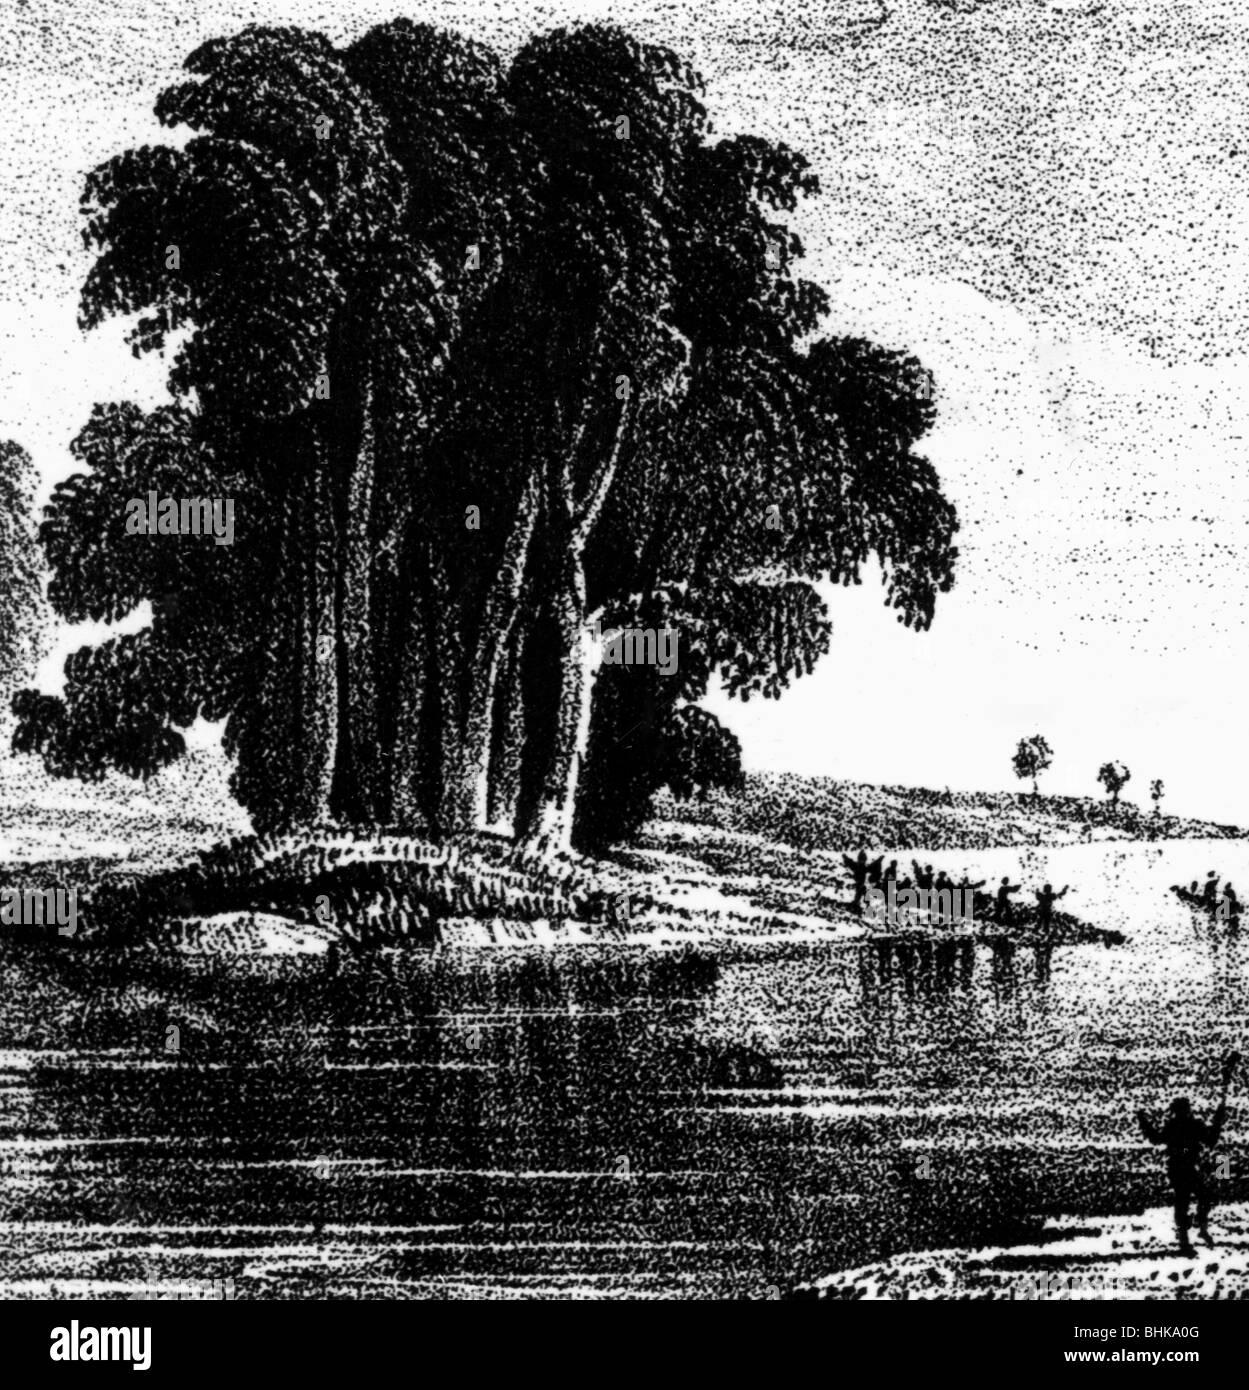 Sturt, Charles, 28.4.1795 - 16.6.1869, British explorer of Australia, scene, Sturt discovers the Darling River, - Stock Image